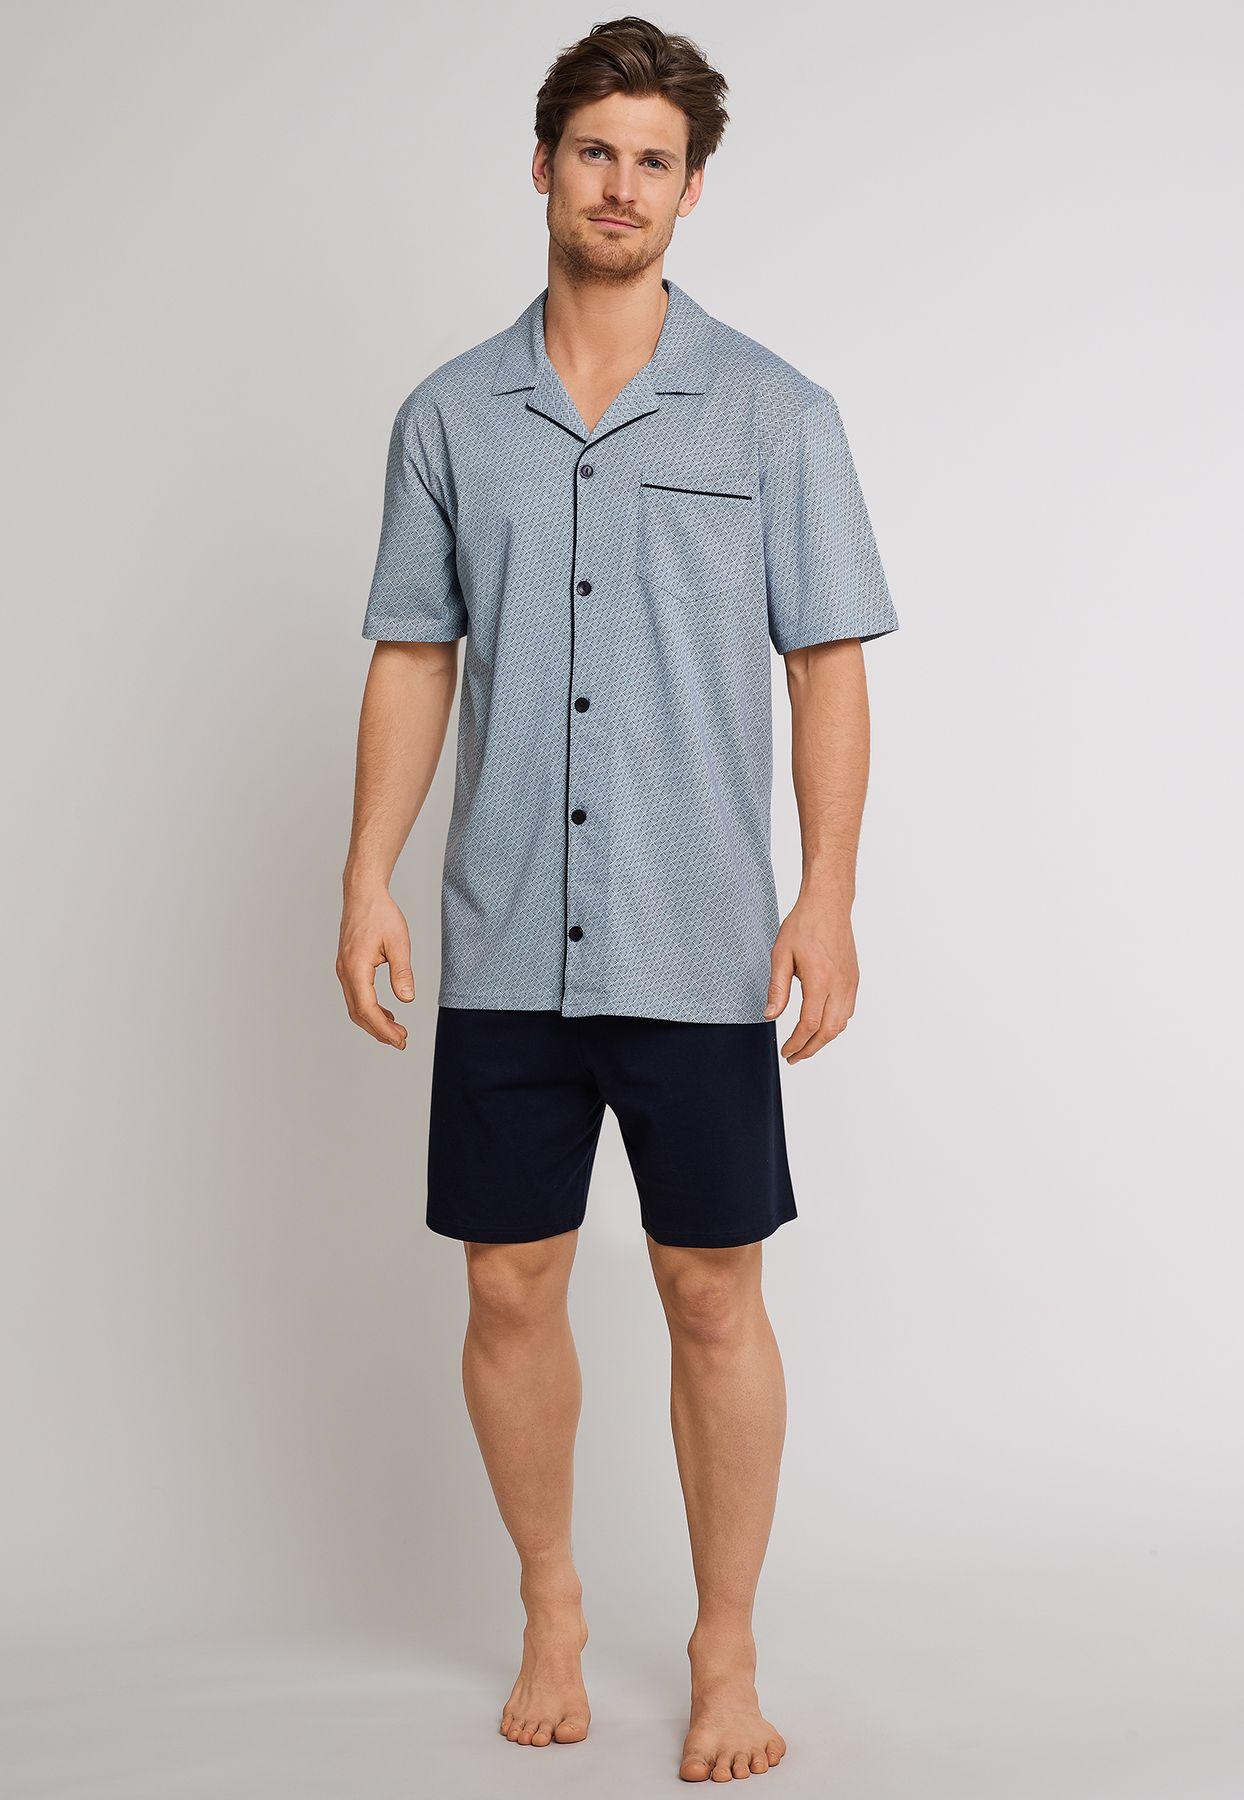 Schiesser - Herren Pyjama kurz Jersey Knopfleiste blau gemustert (163638-803) – Bild 3